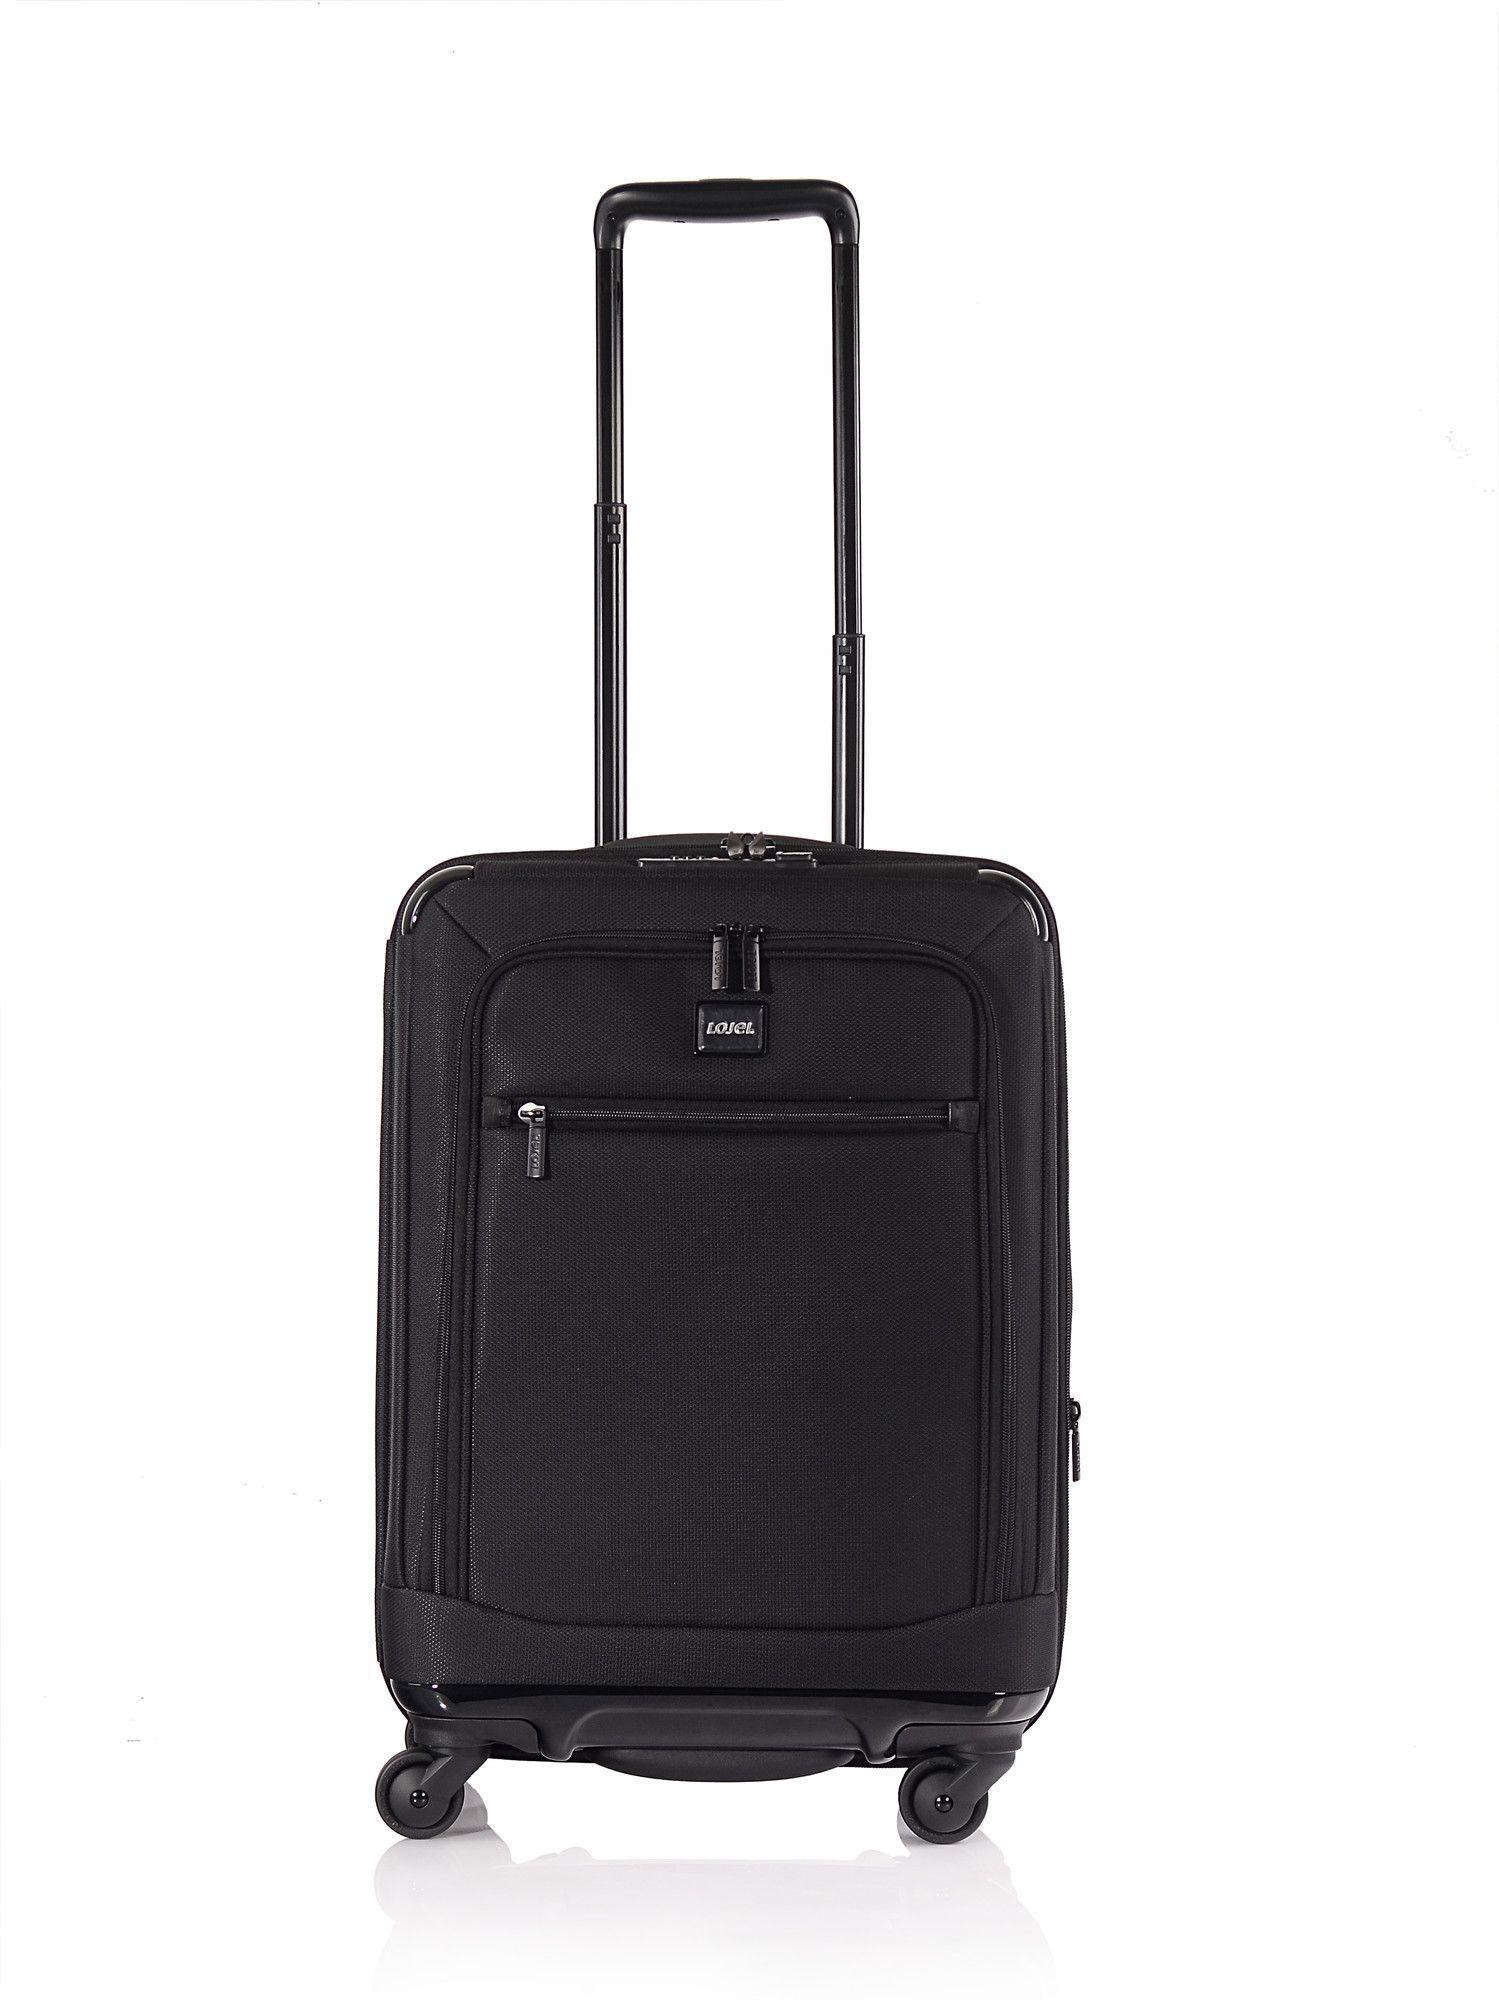 "Exos 19"" Hardside Spinner Carry-On Suitcase"